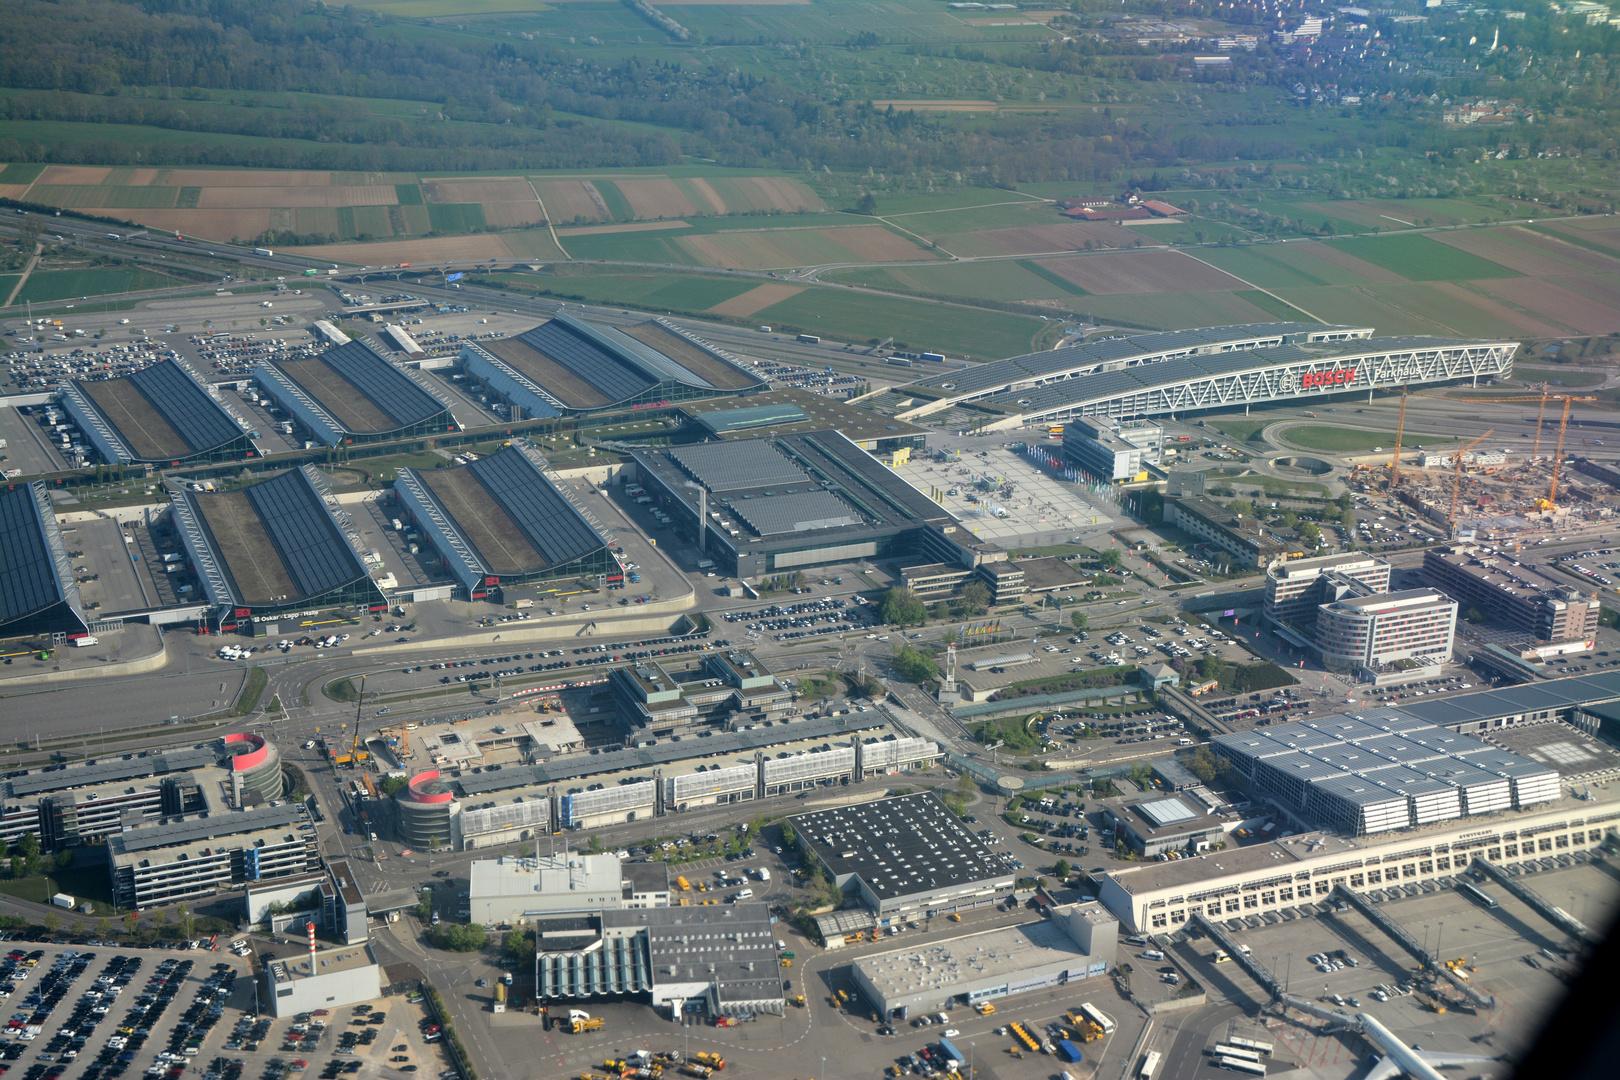 Flughafen Stuttgart